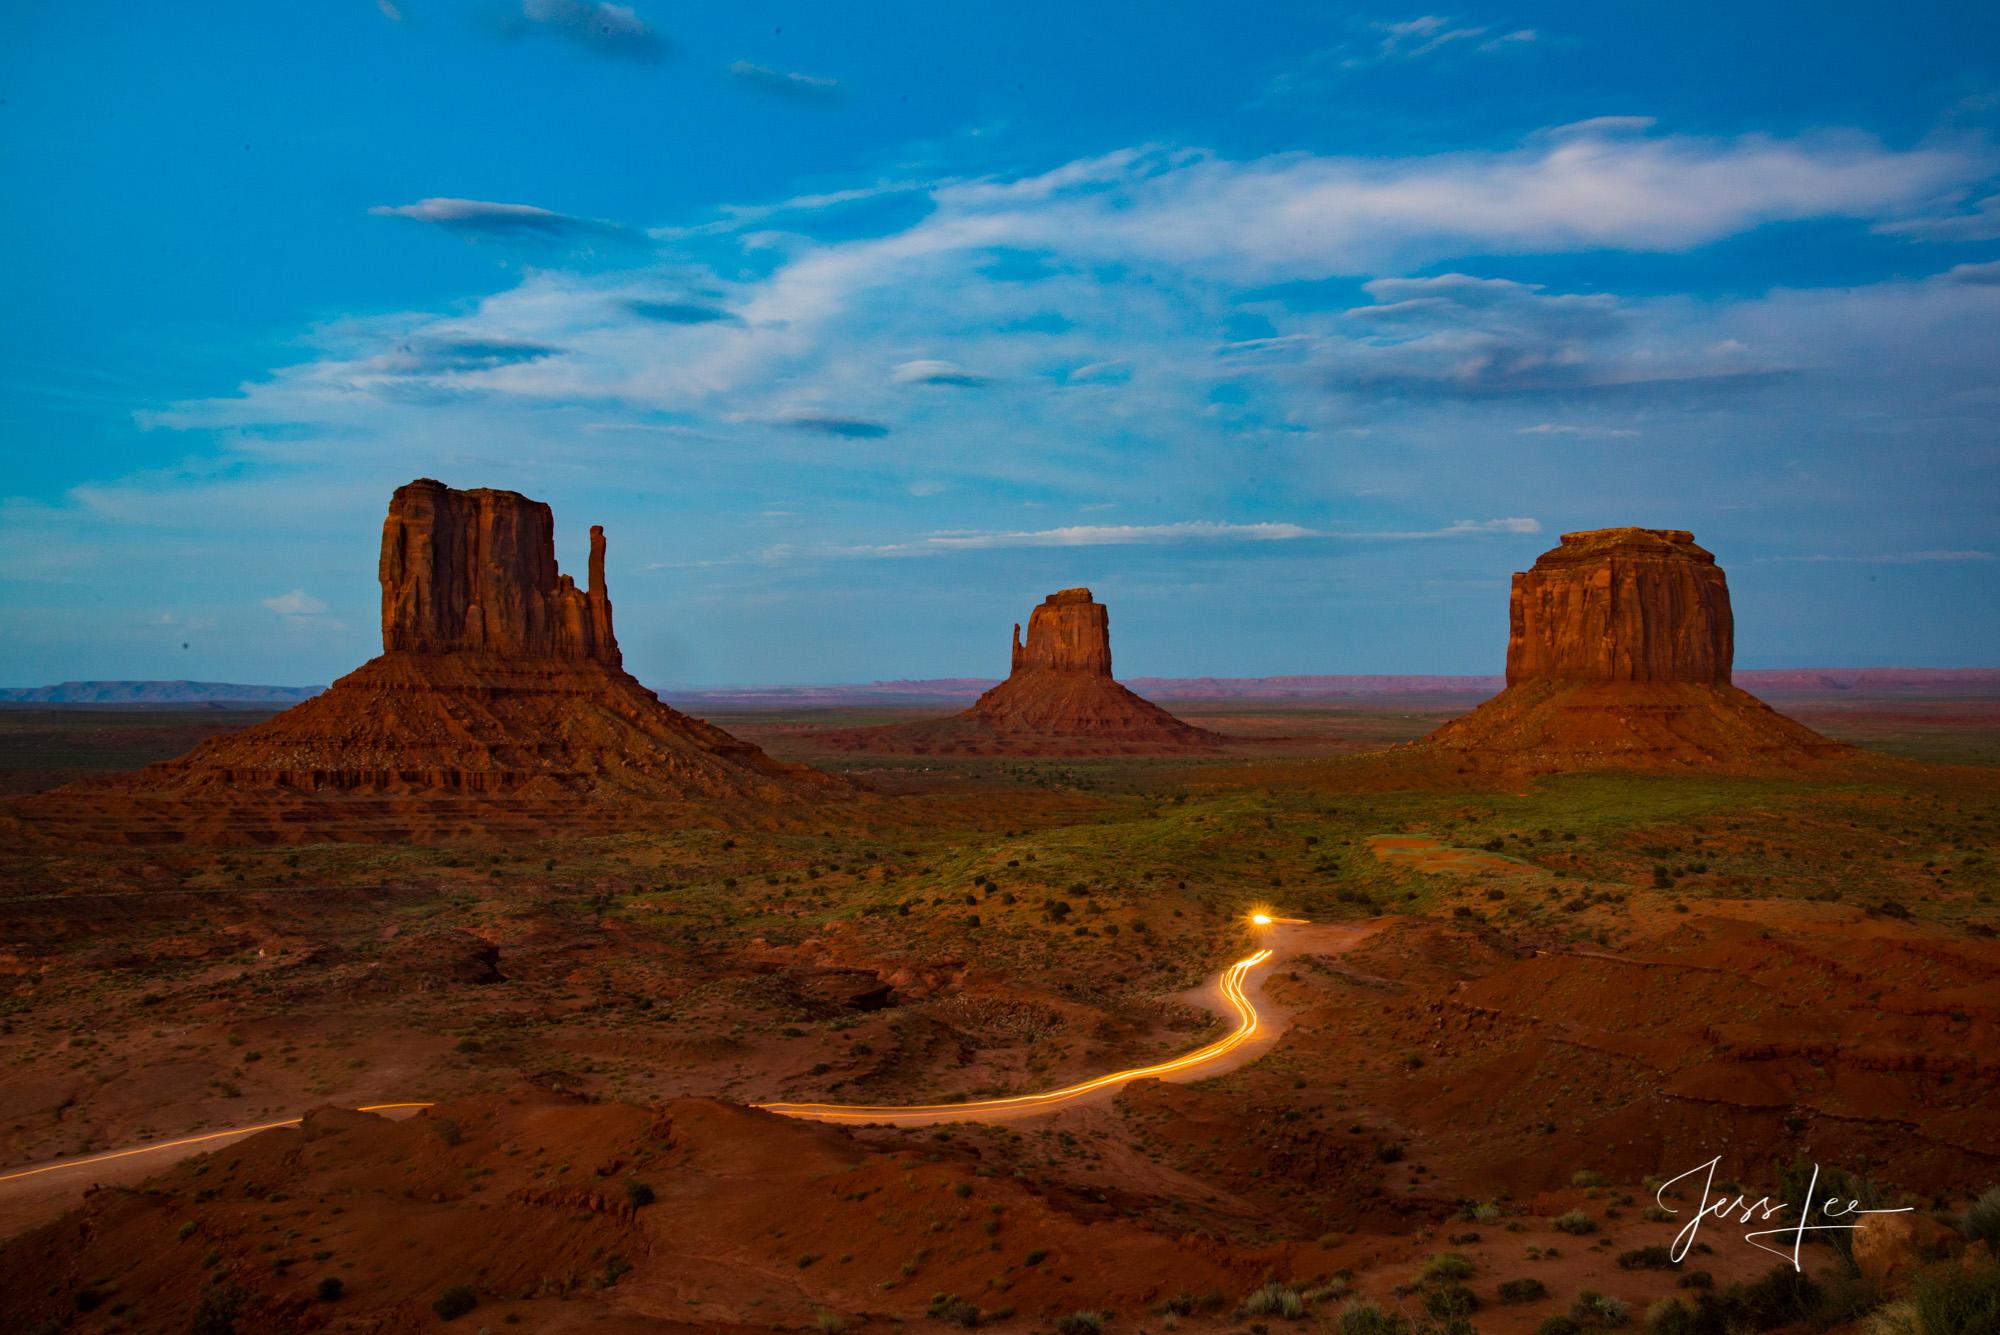 desert, dry, rivers, lakes, monument valley, navajo, slot canyon,, photo